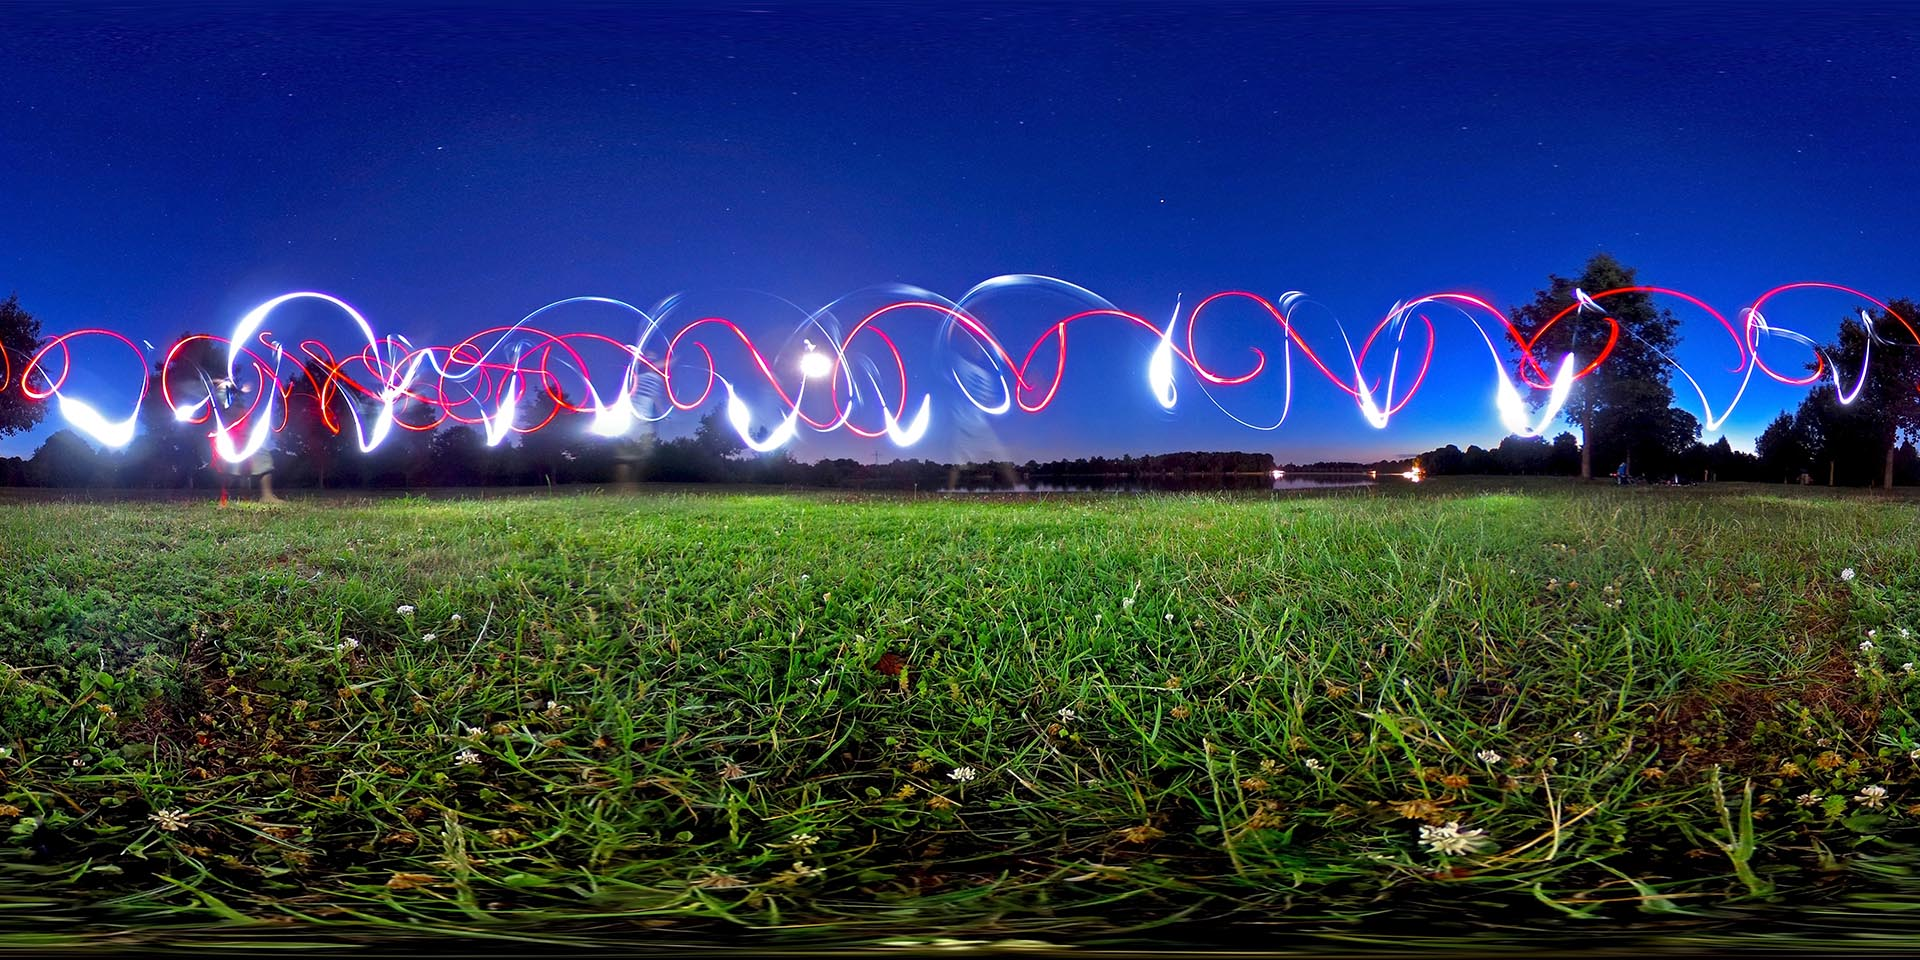 360 degrees light painting